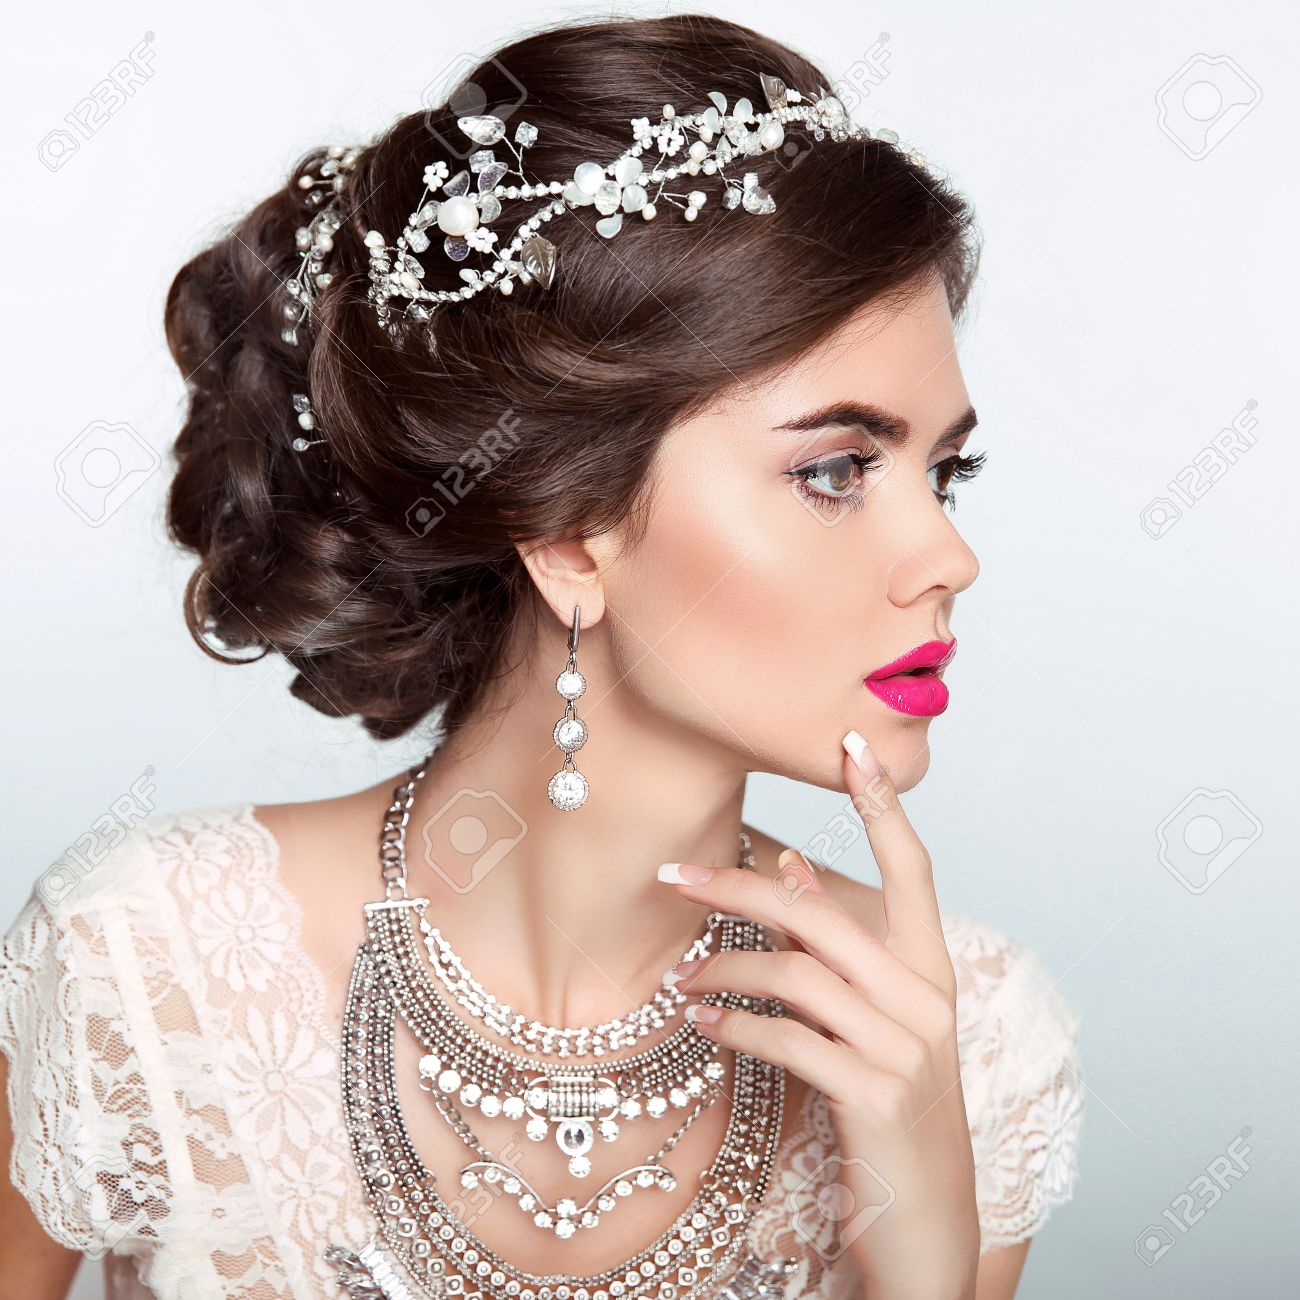 Modeles coiffure pour mariage